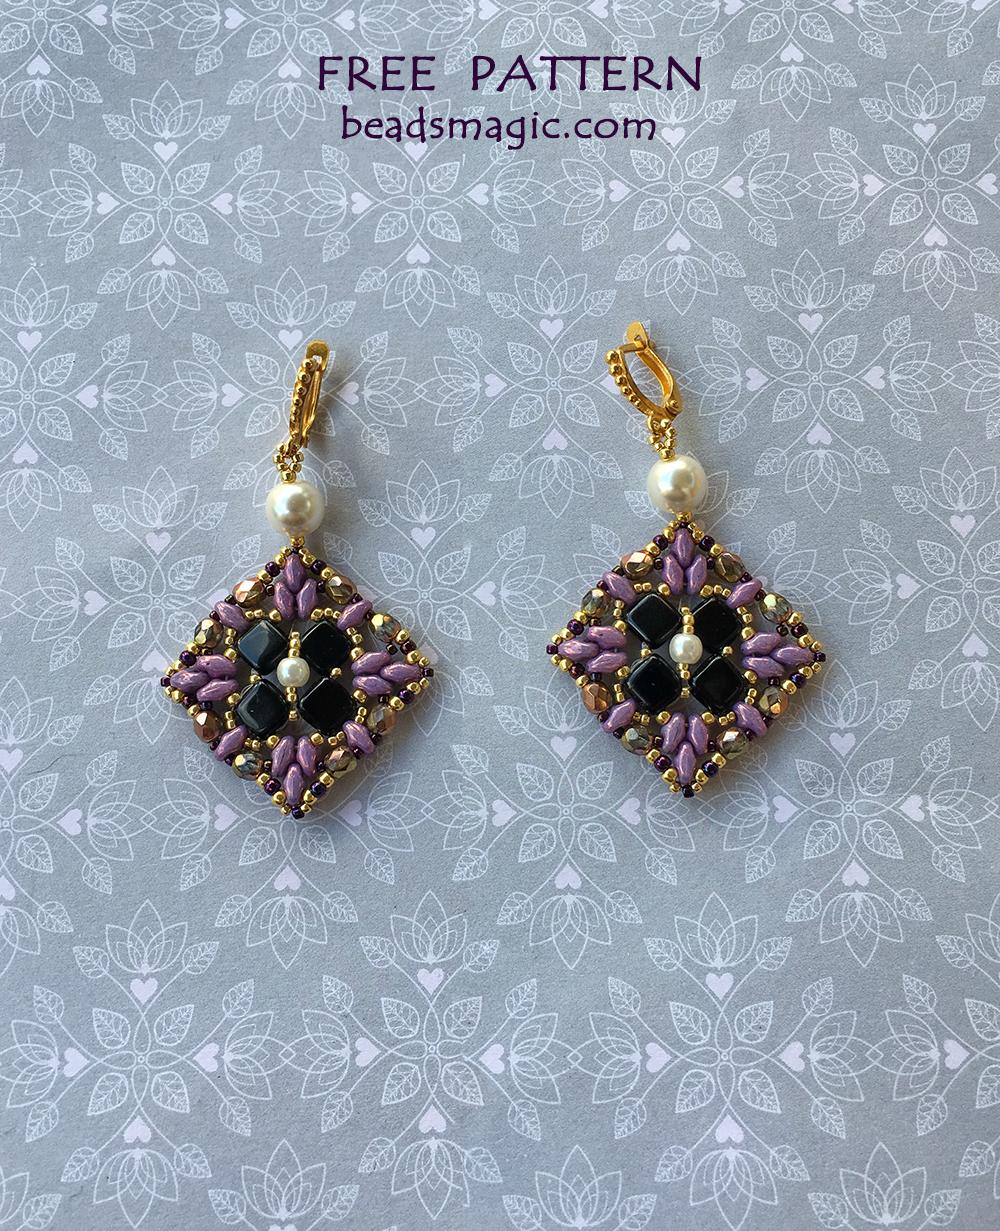 Free pattern for earrings Sara